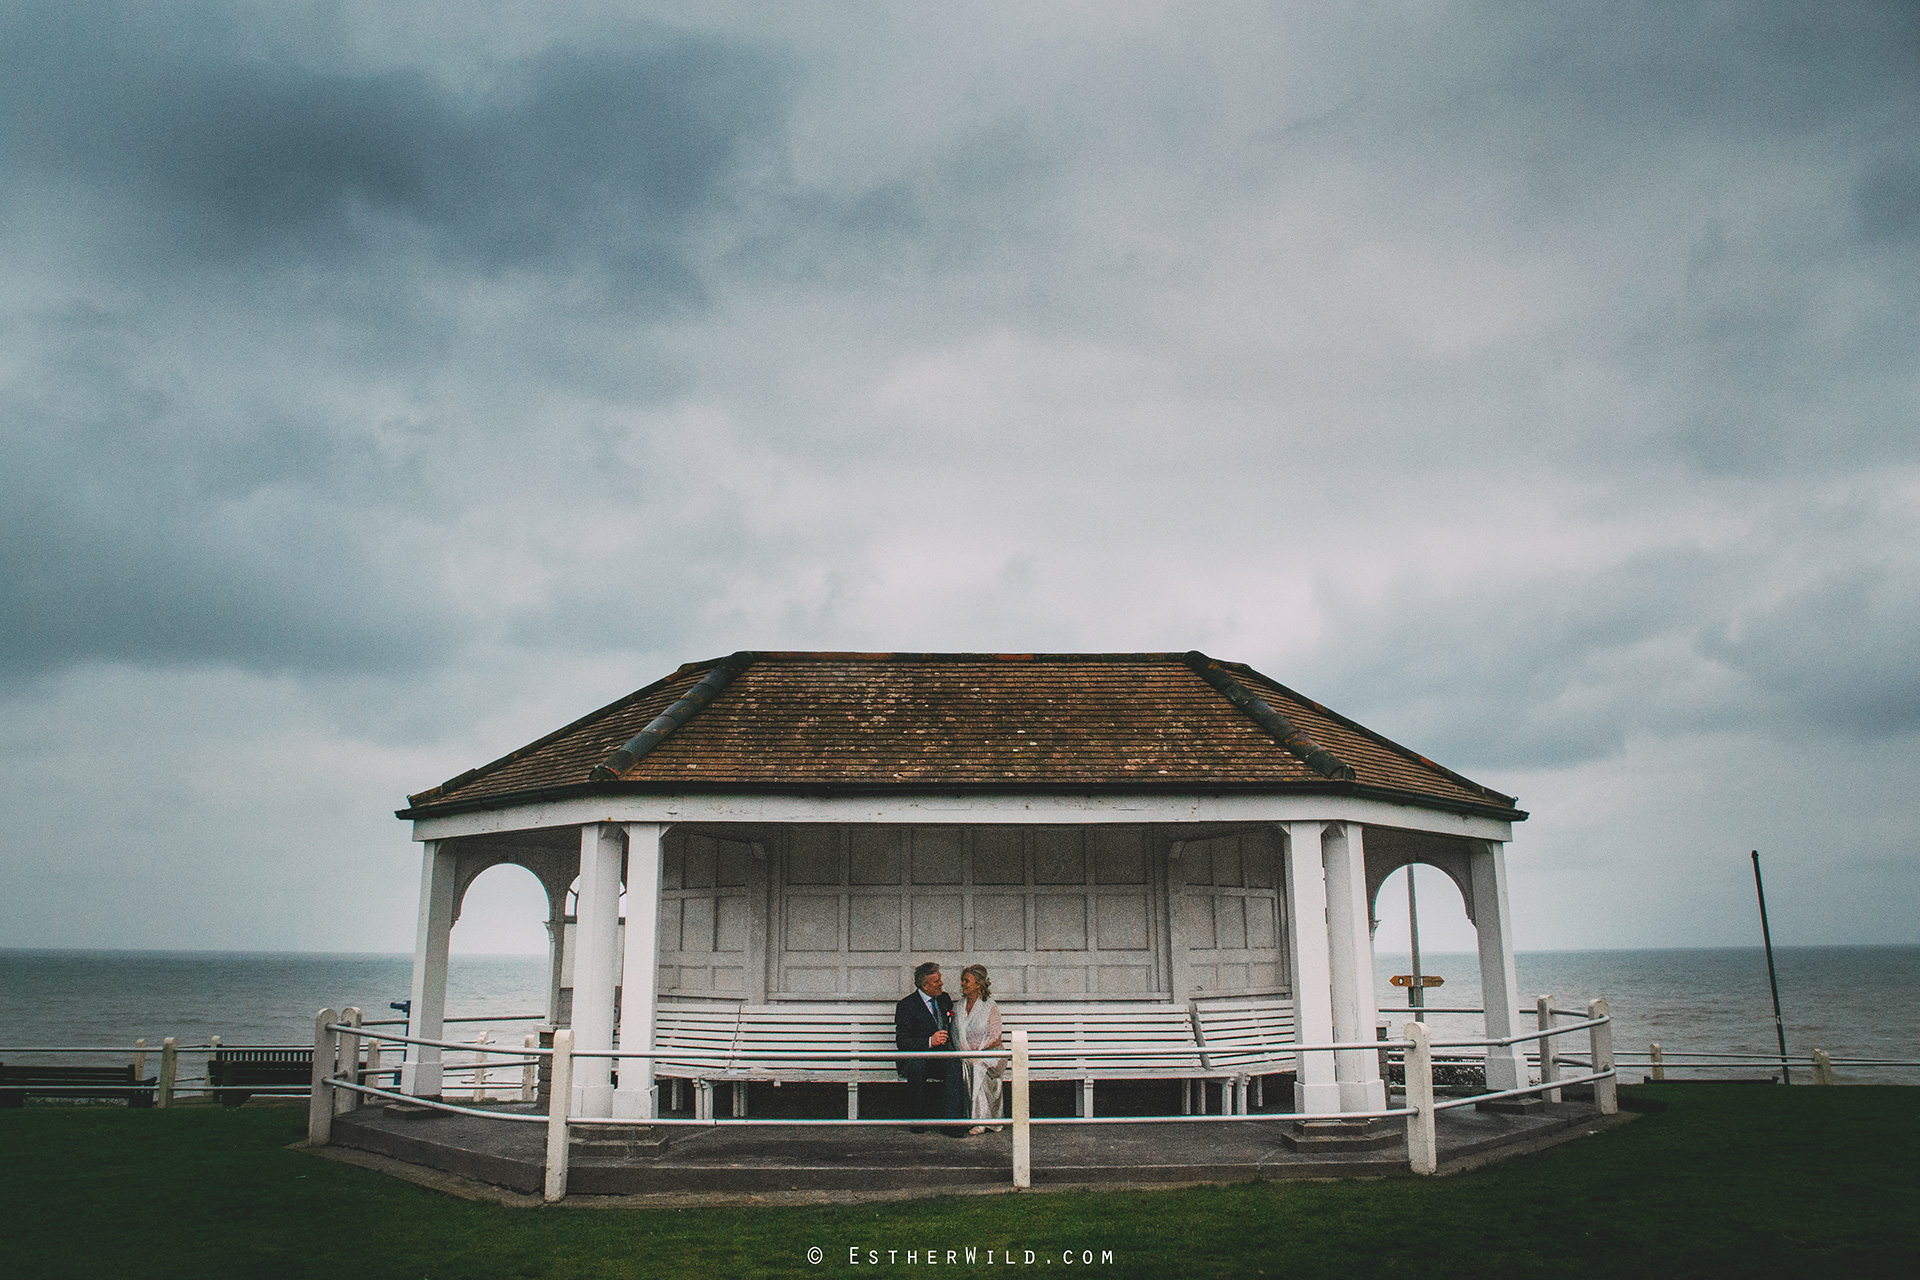 0217_Cromer_North_Lodge_Rocket_House_Wedding_Esther_Wild_IMG_4445.jpg